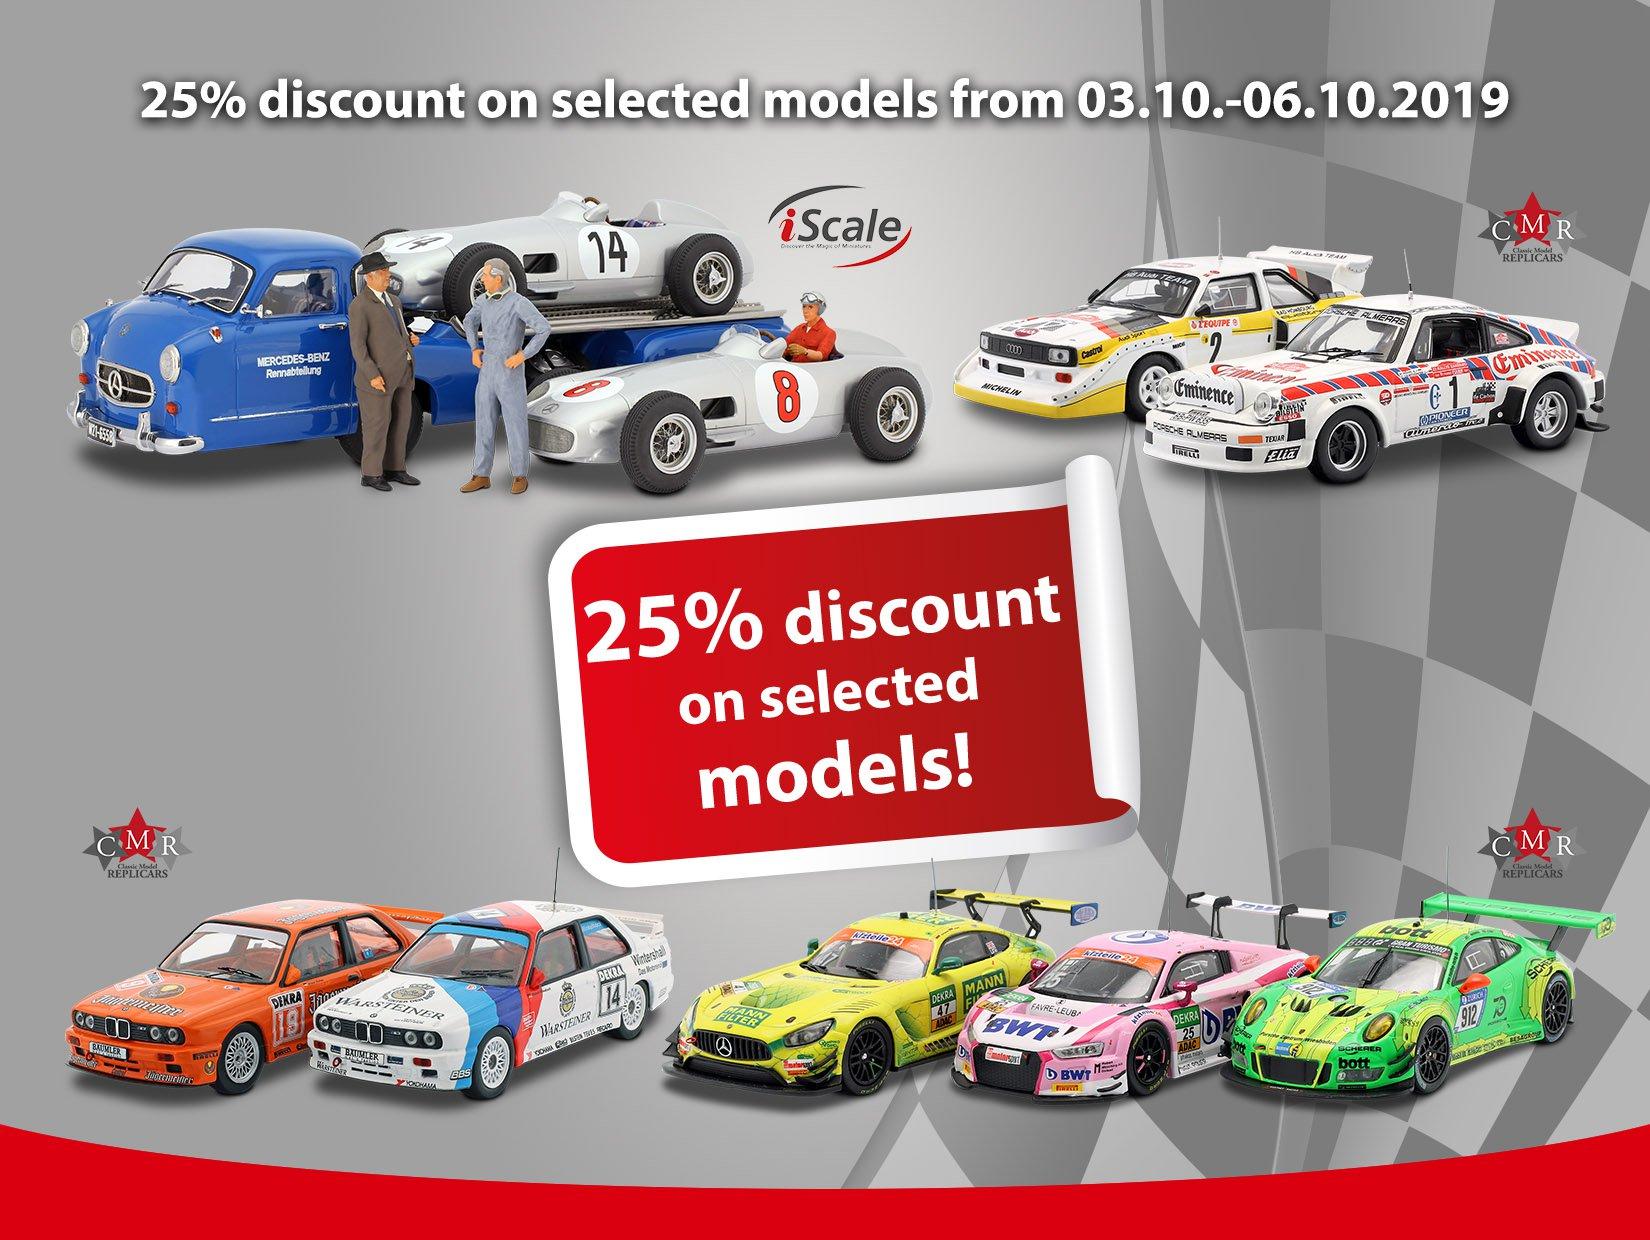 25% korting op meer dan 400 geselecteerde modelauto's @CK-Modelcars